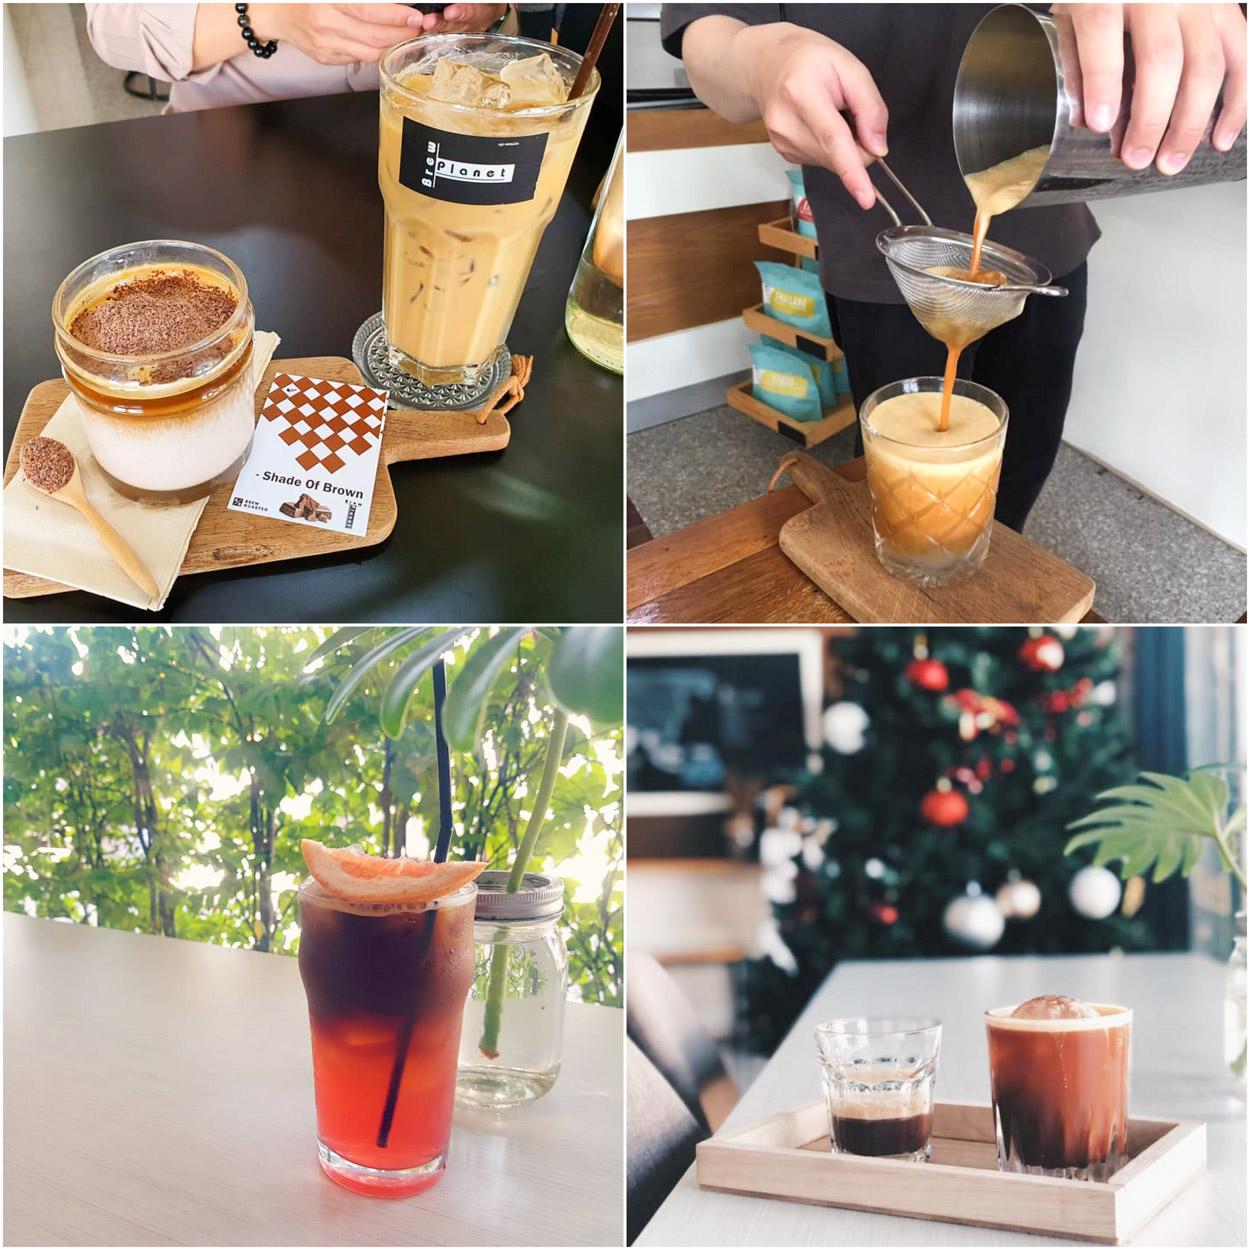 Brewplanet  coffee specialty ร้านดีประจำขอนแก่น กาแฟหอมเข้มข้นมีเมนูหลากหลาย บาริสต้าก็แนะนำดีมากต้องห้ามพลาด